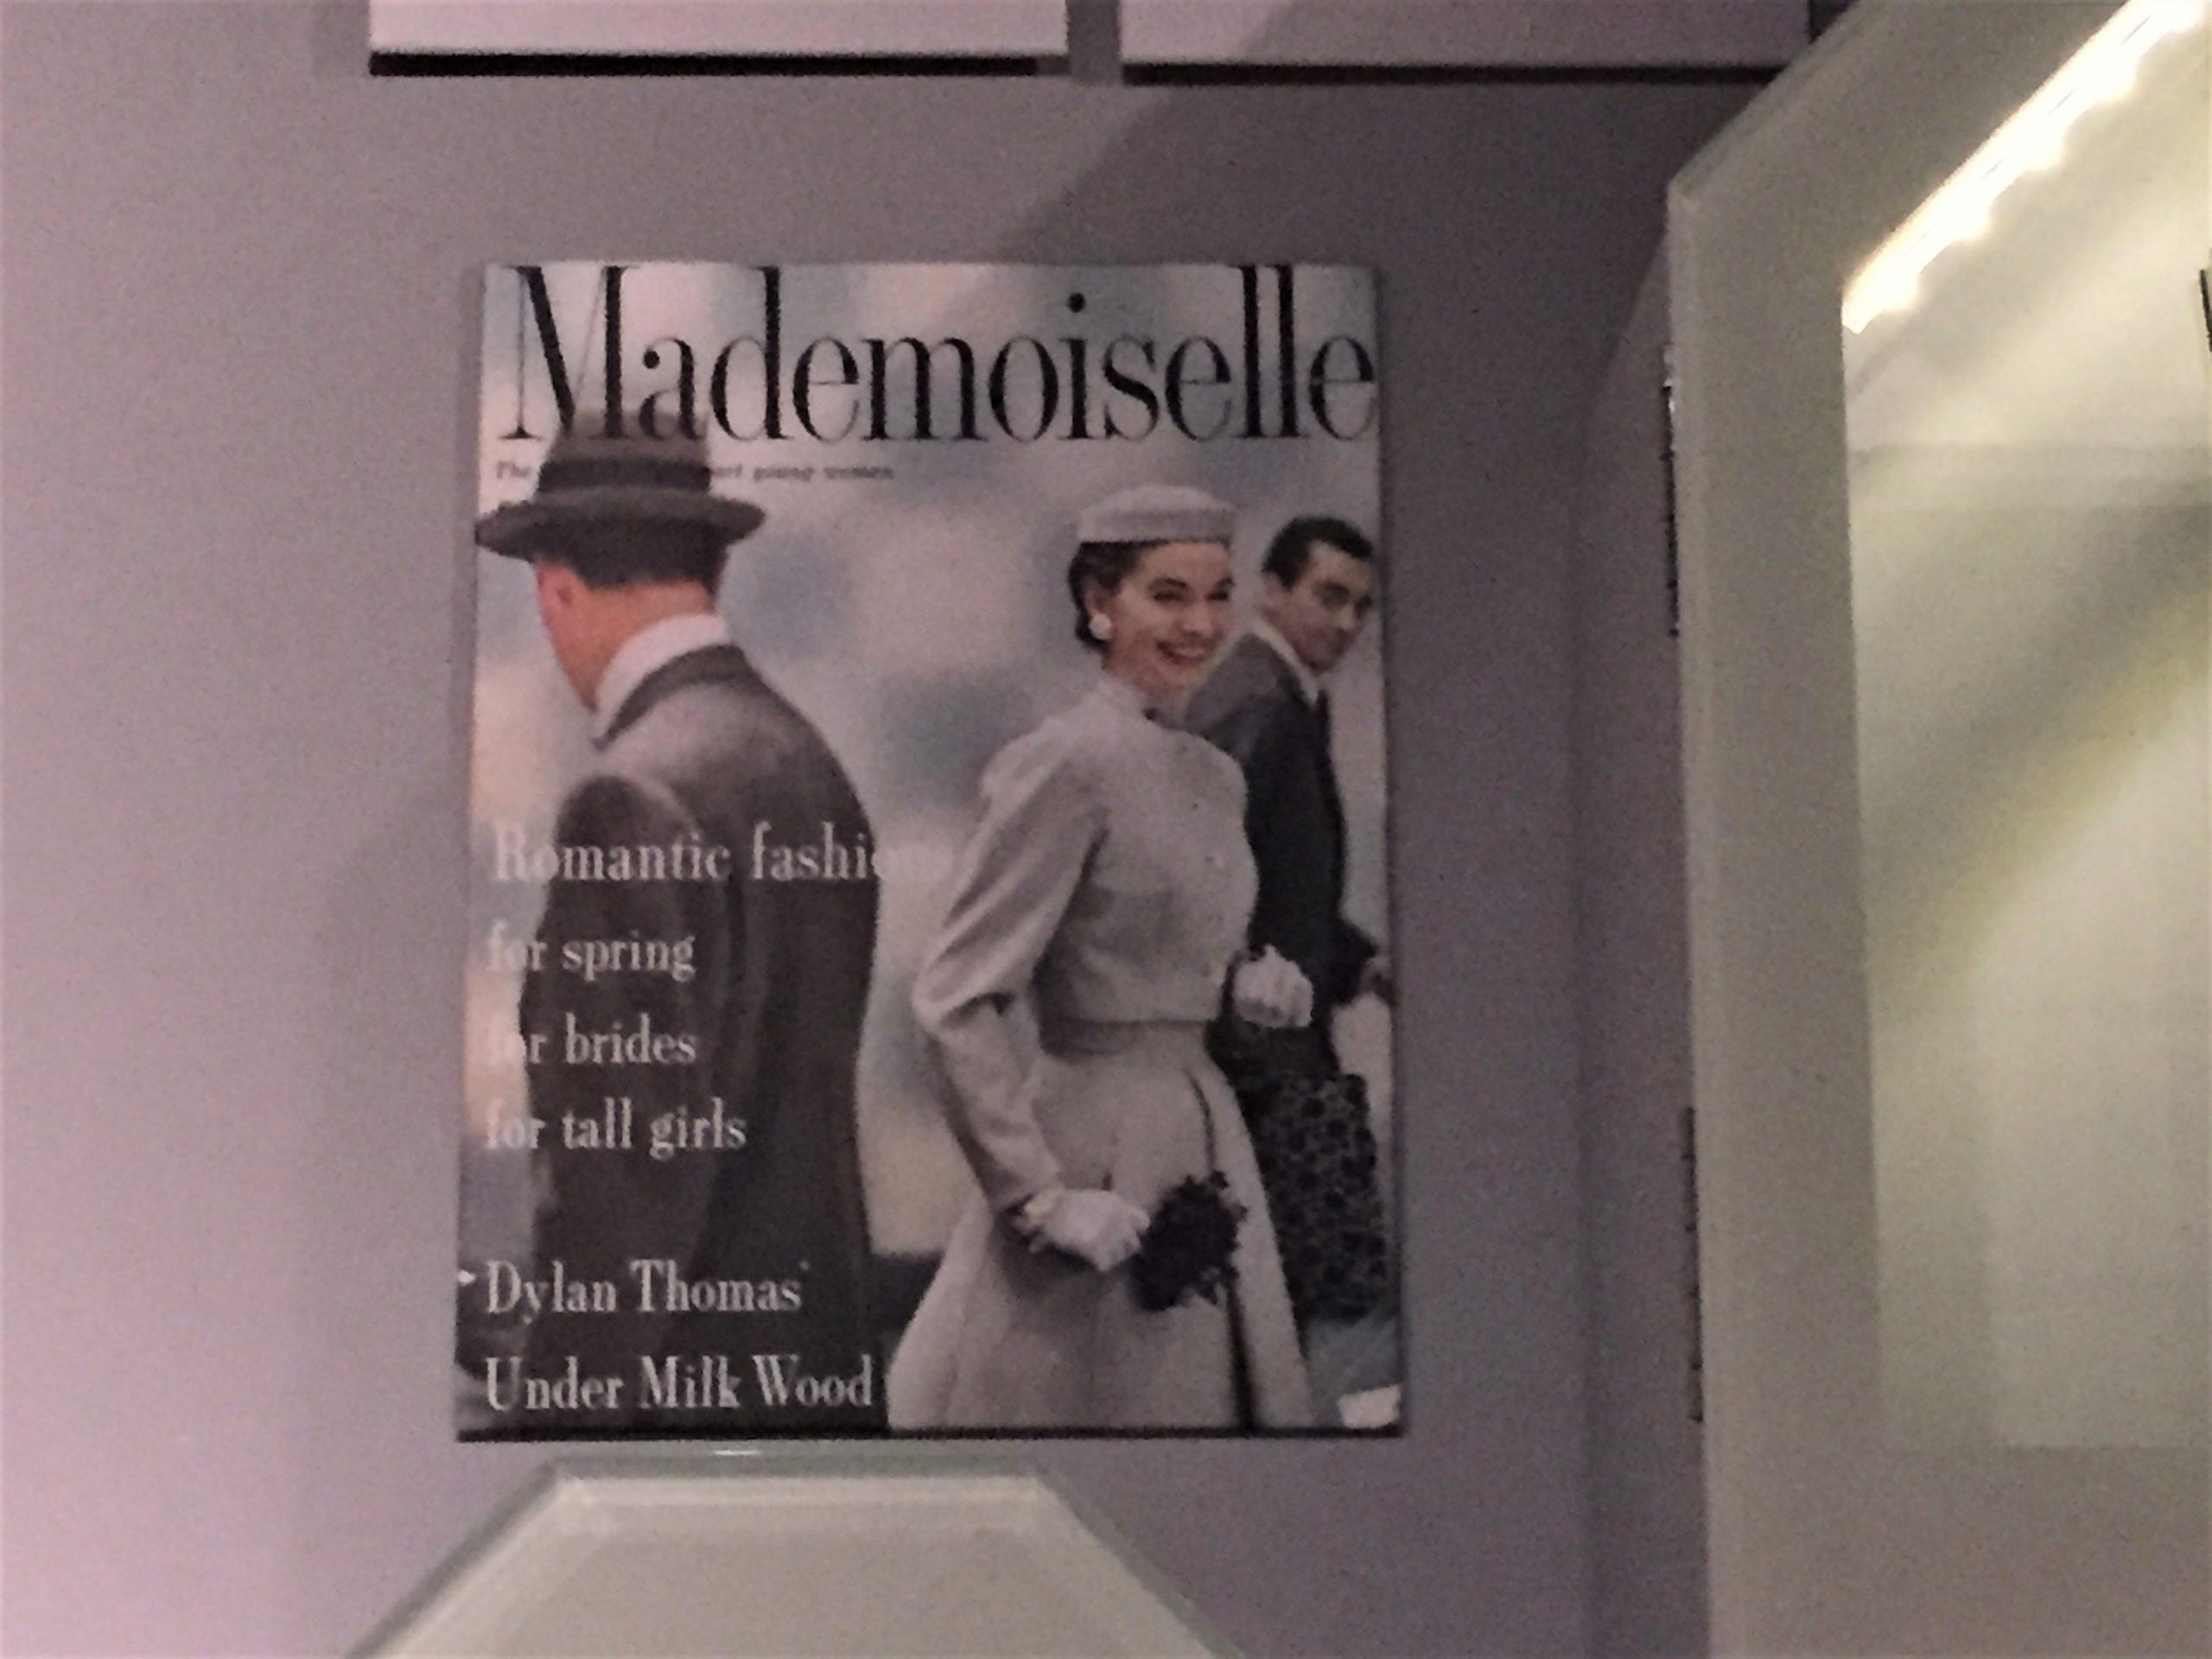 Dylan Thomas, Sylvia Plath, Under Milk Wood and Mademoiselle Magazine